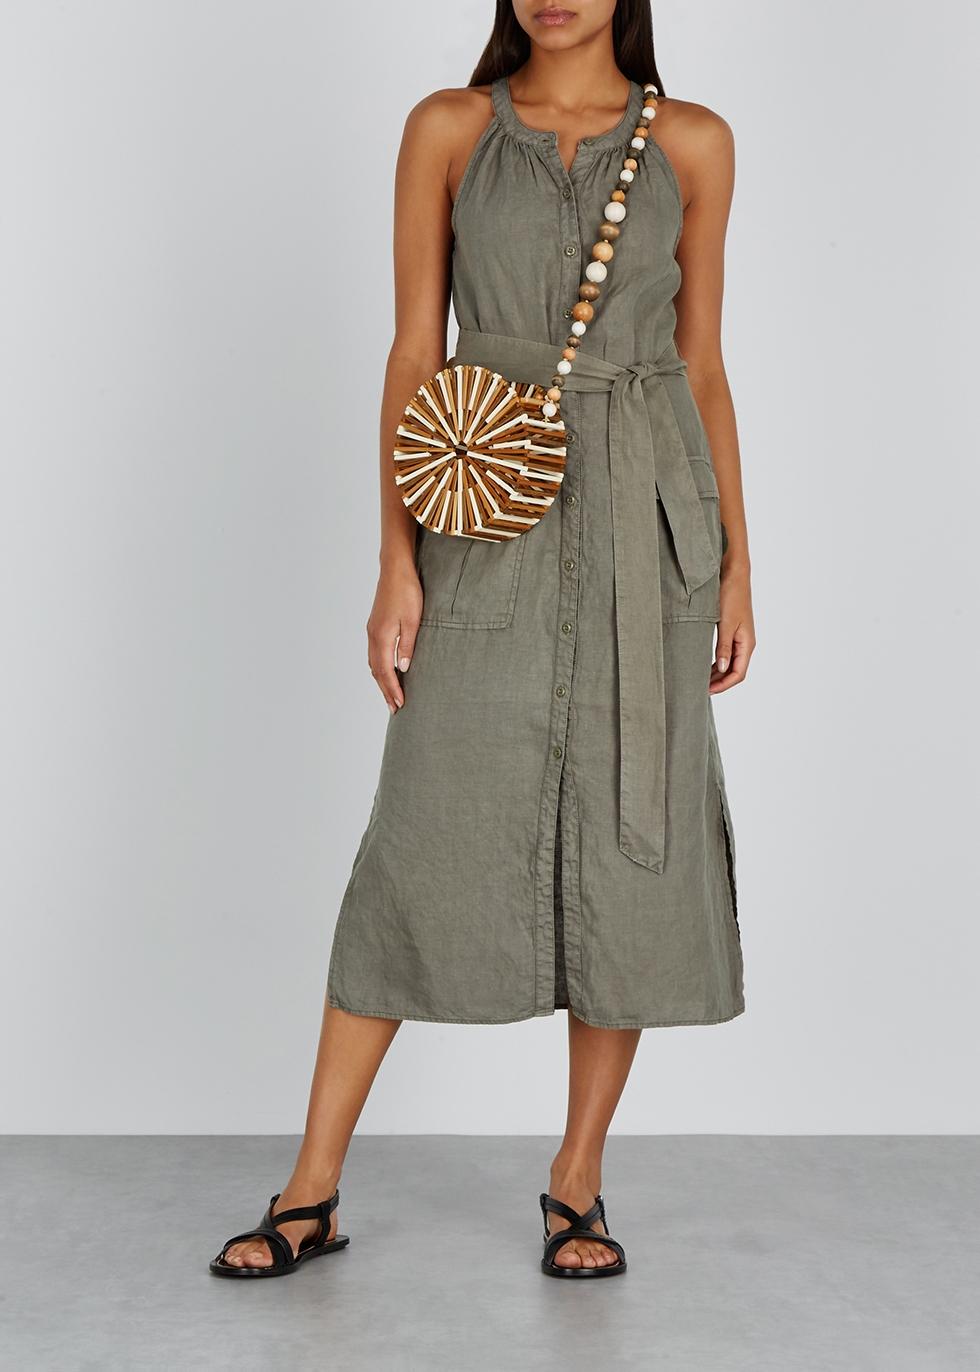 Edelie army green linen midi dress - Joie